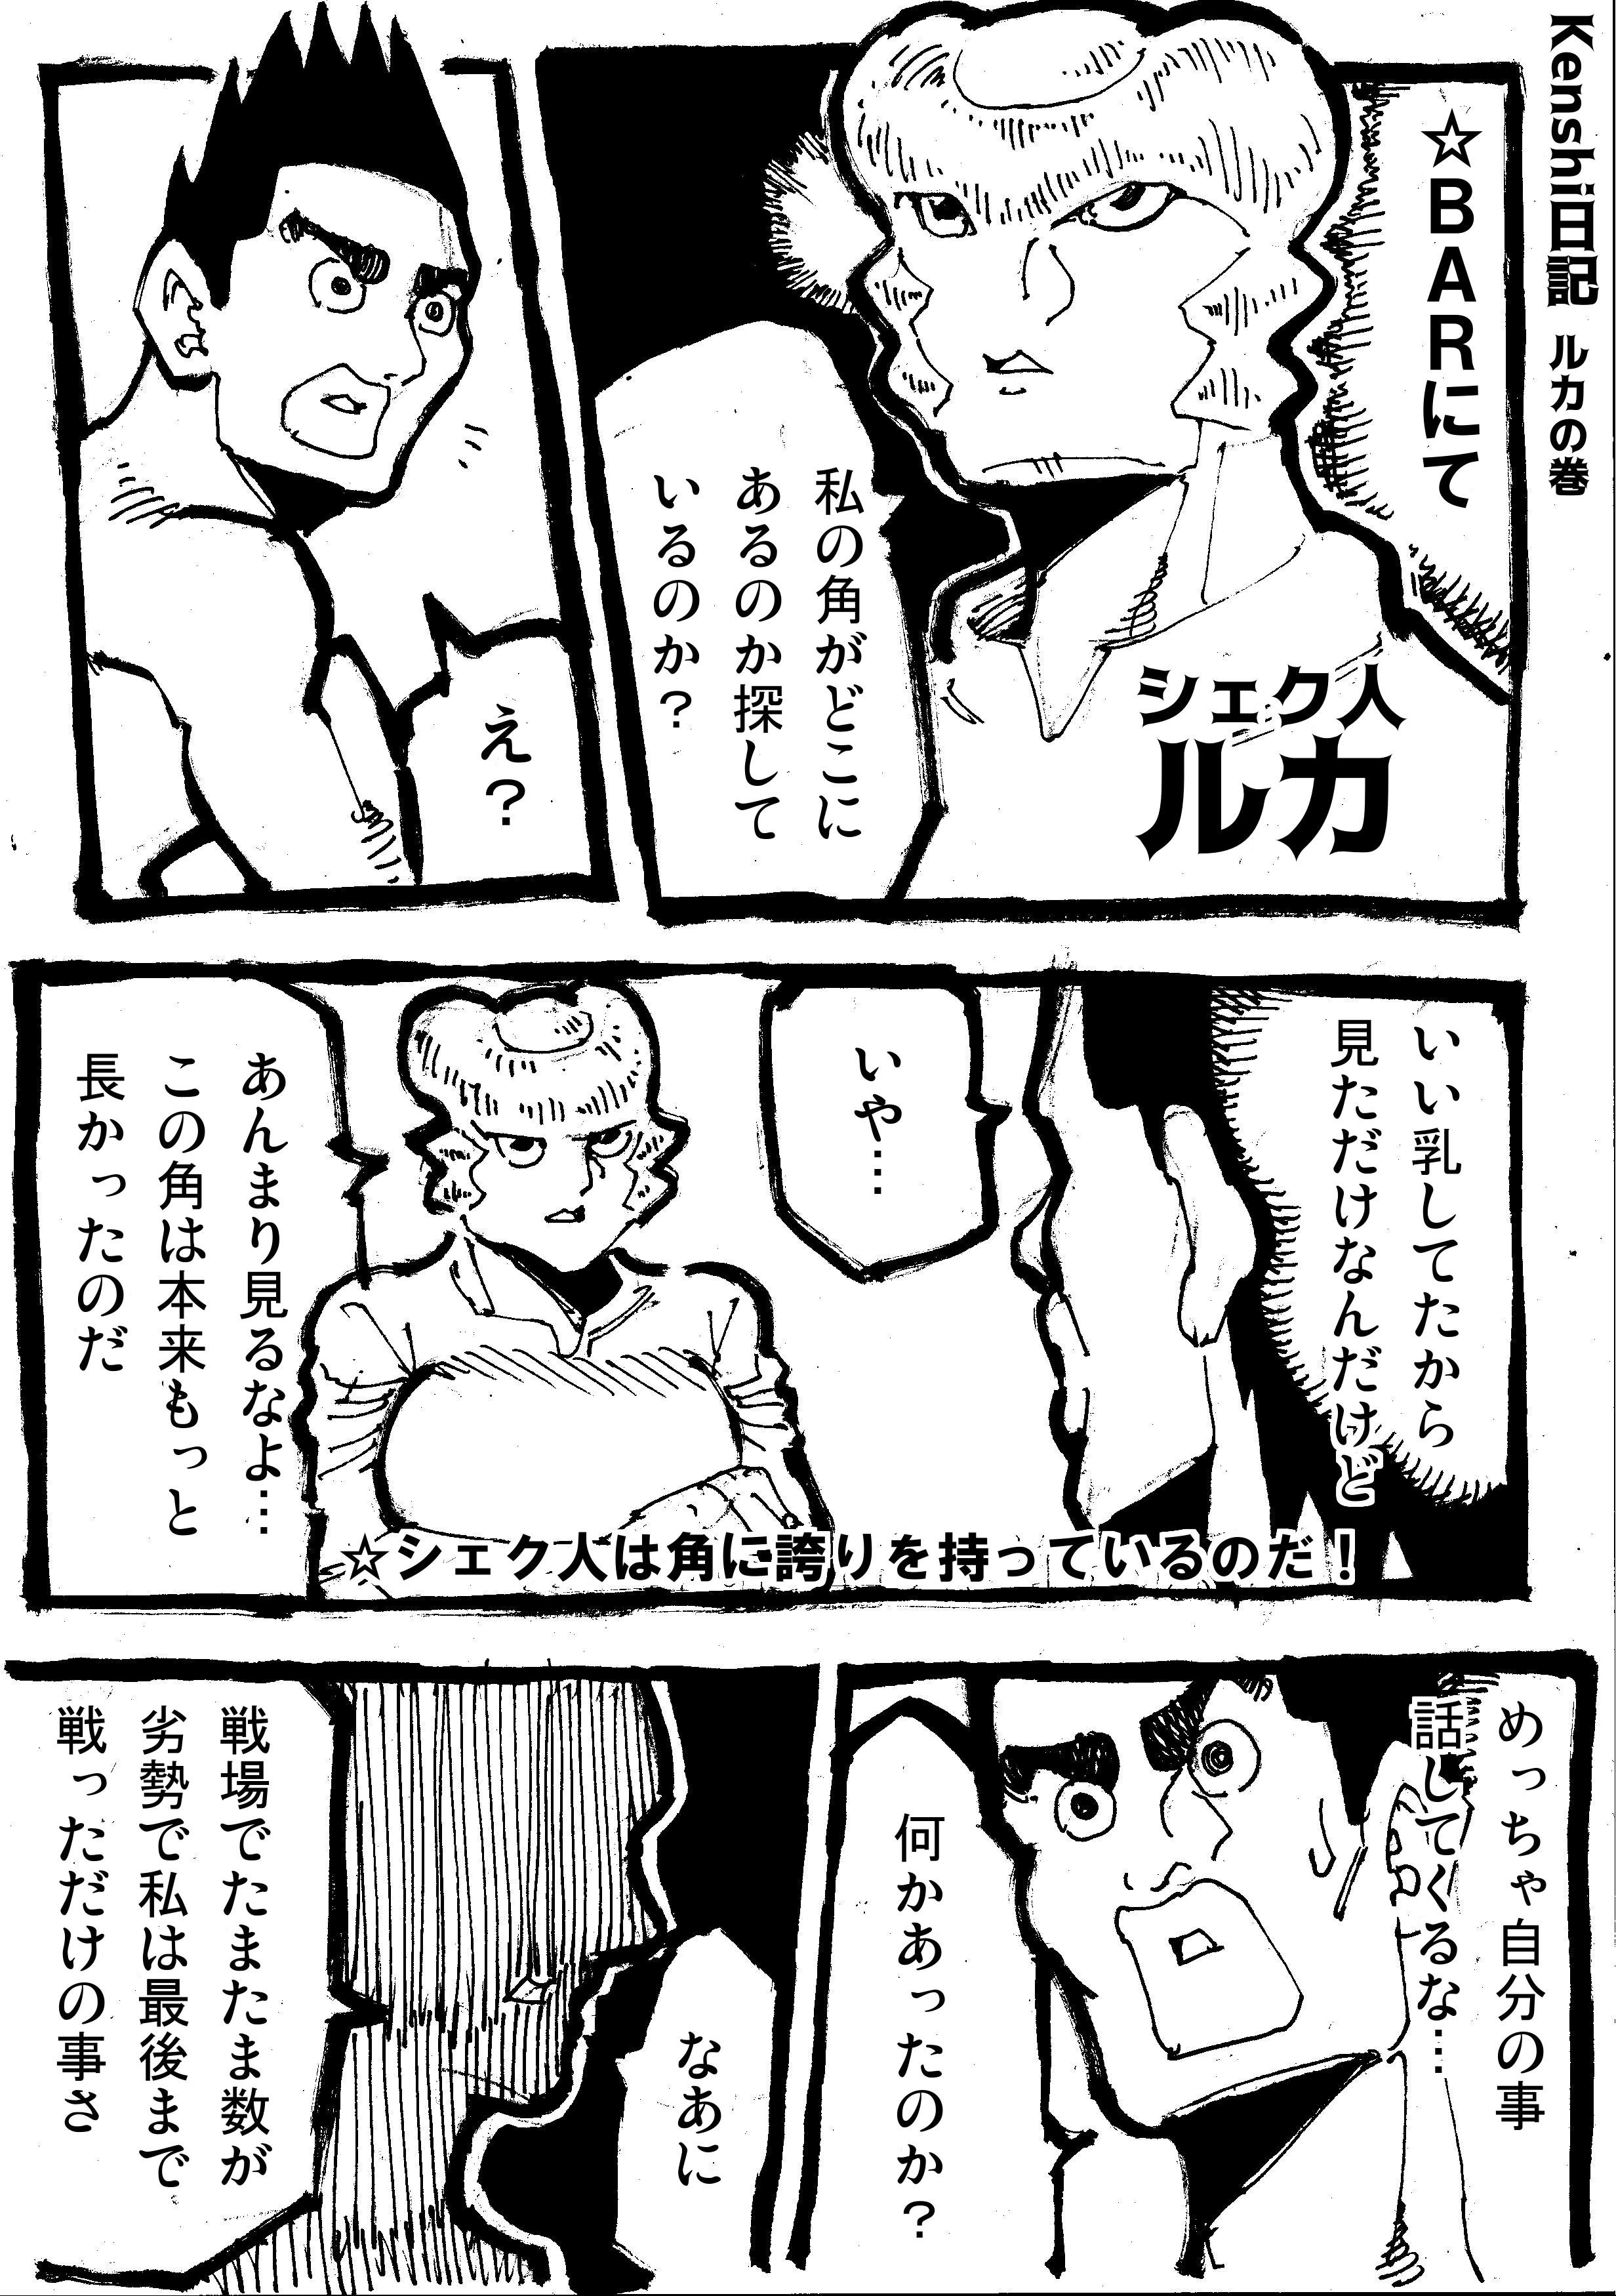 Kenshi日記6 ルカの巻